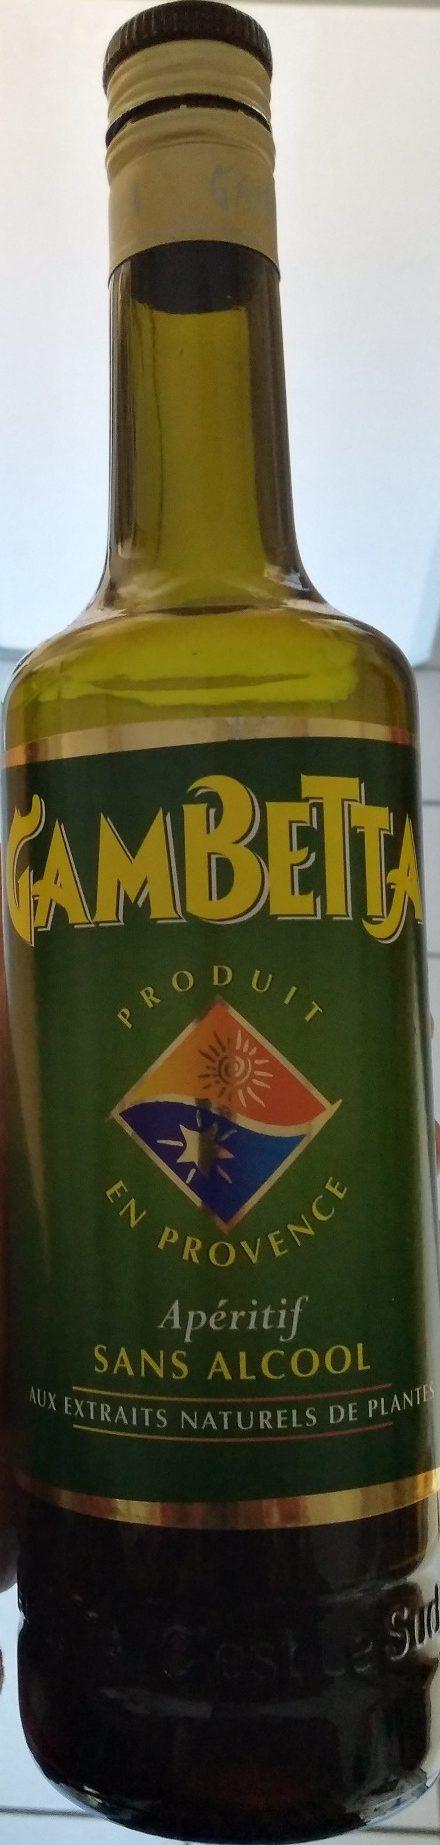 Apéritif Gambetta - Product